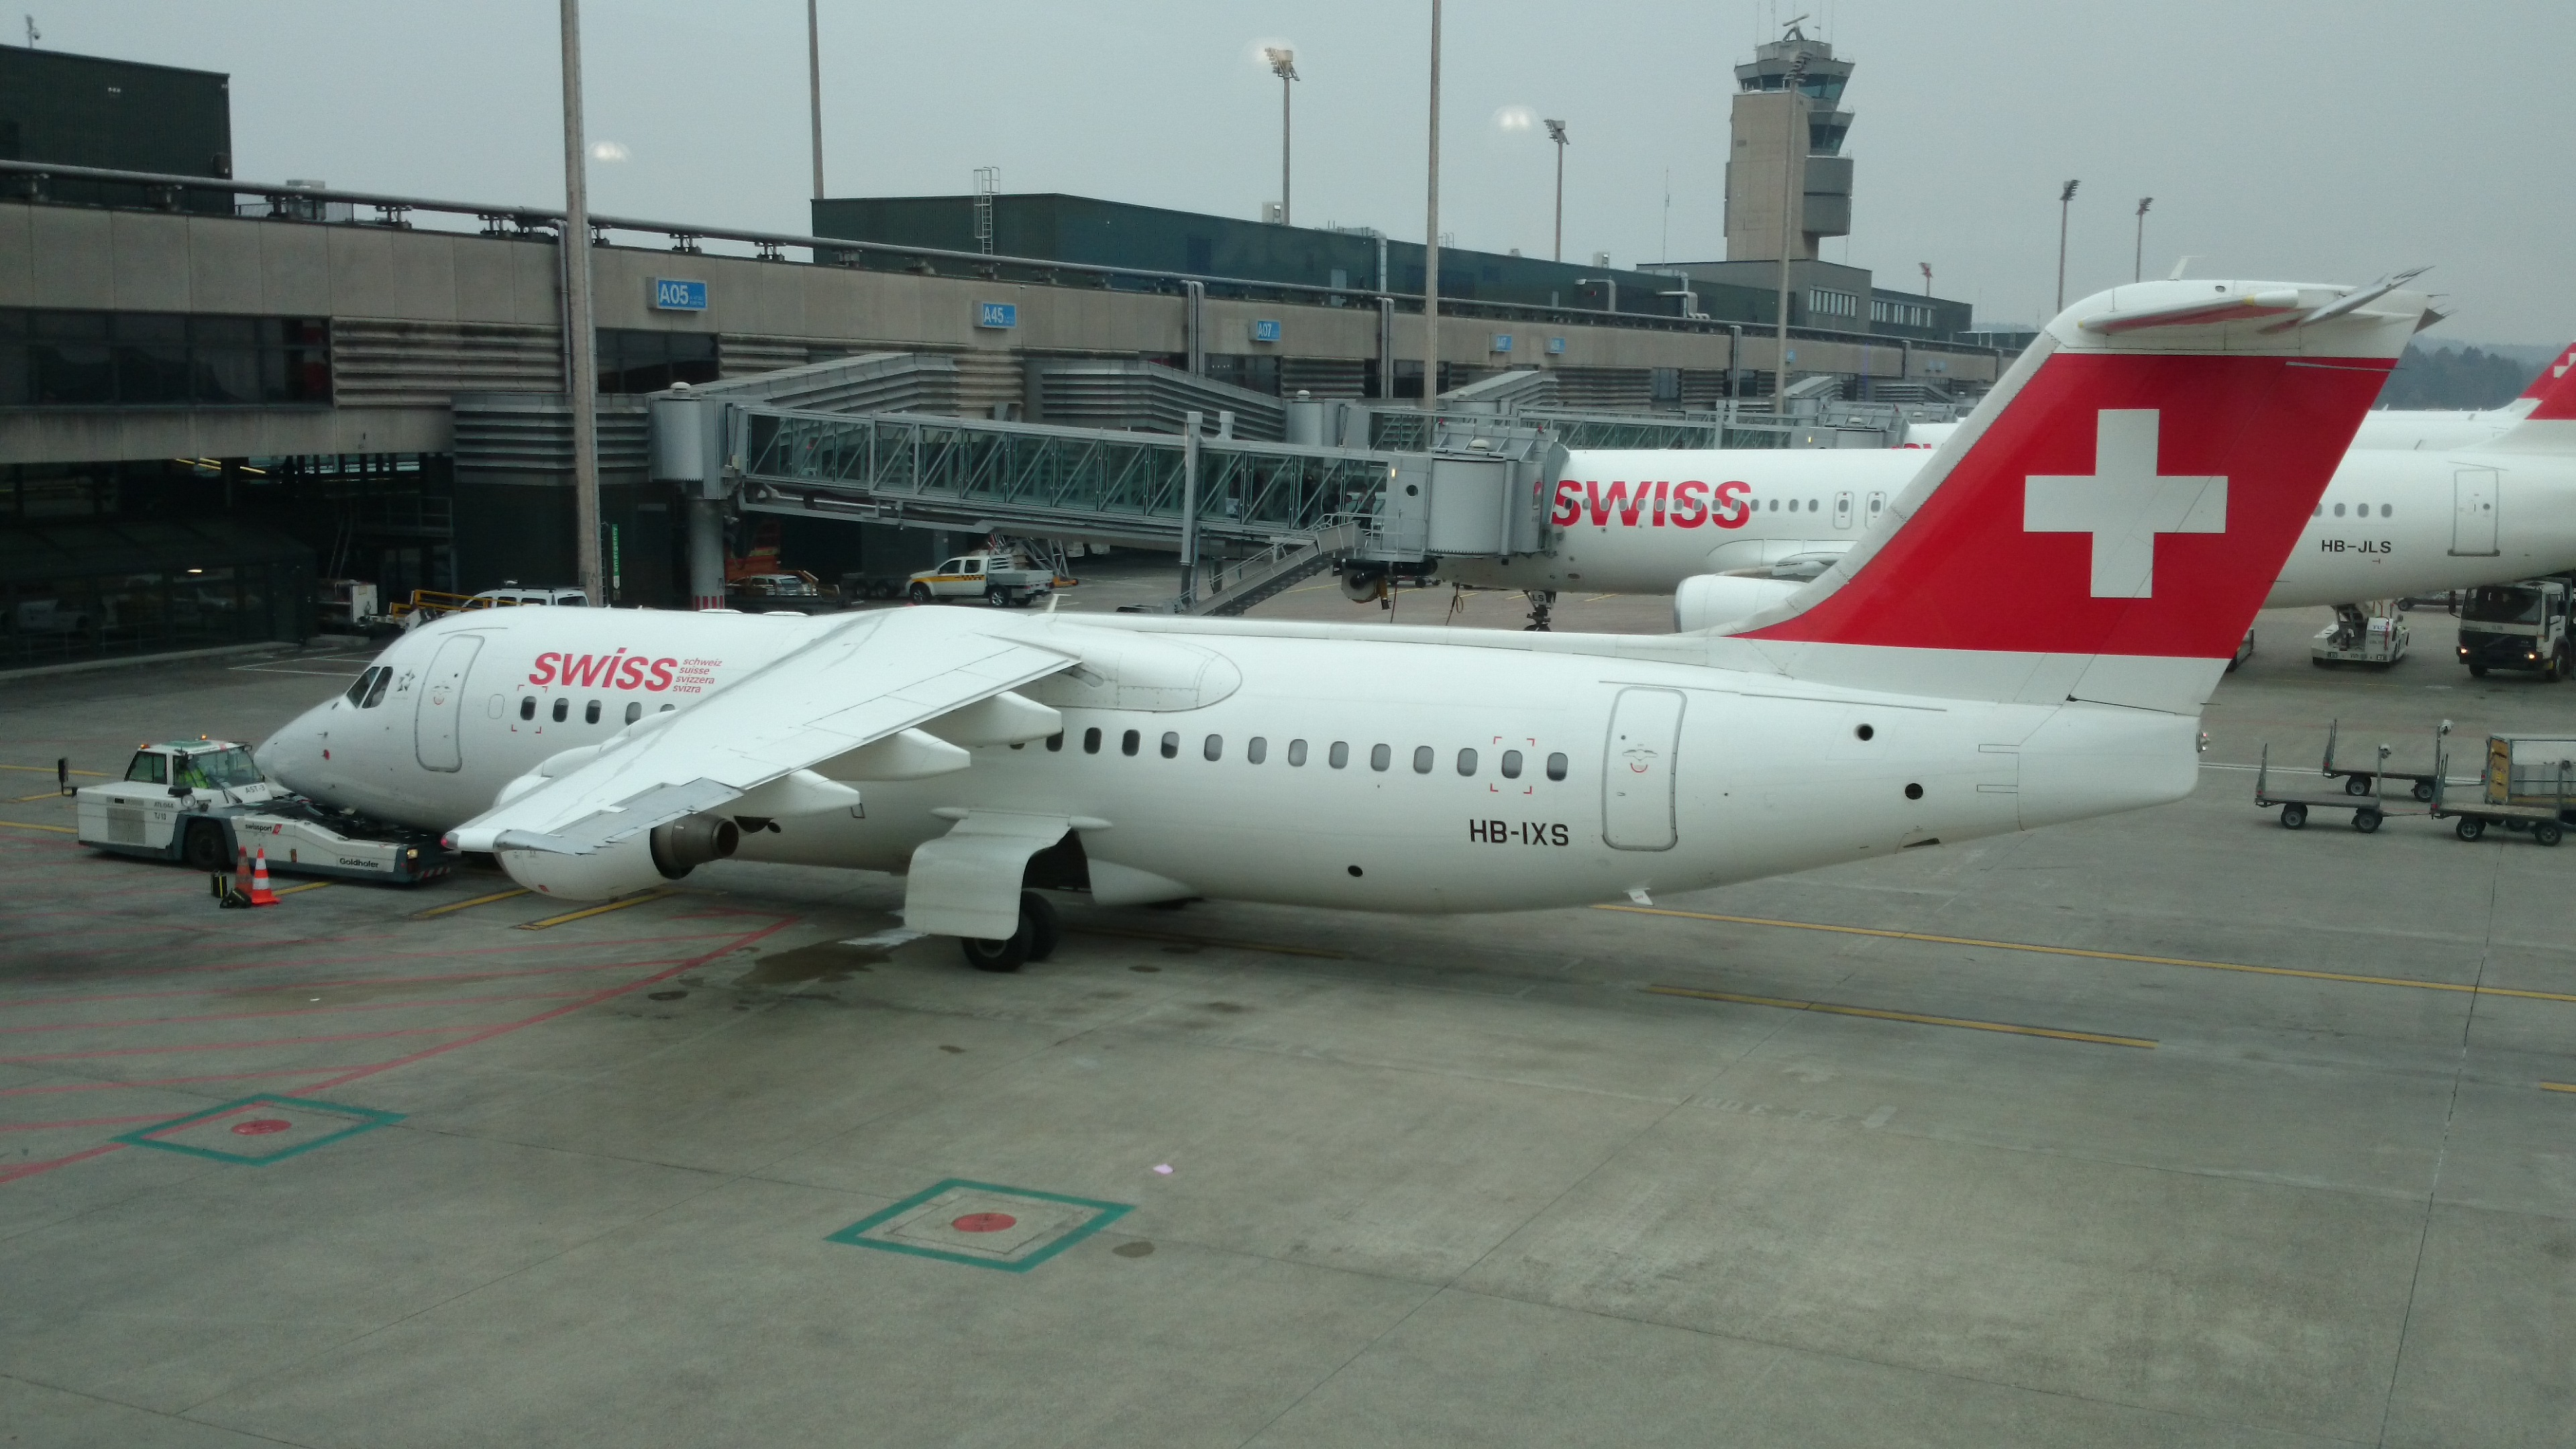 File:Swiss Avro Regional Jet RJ100.JPG.